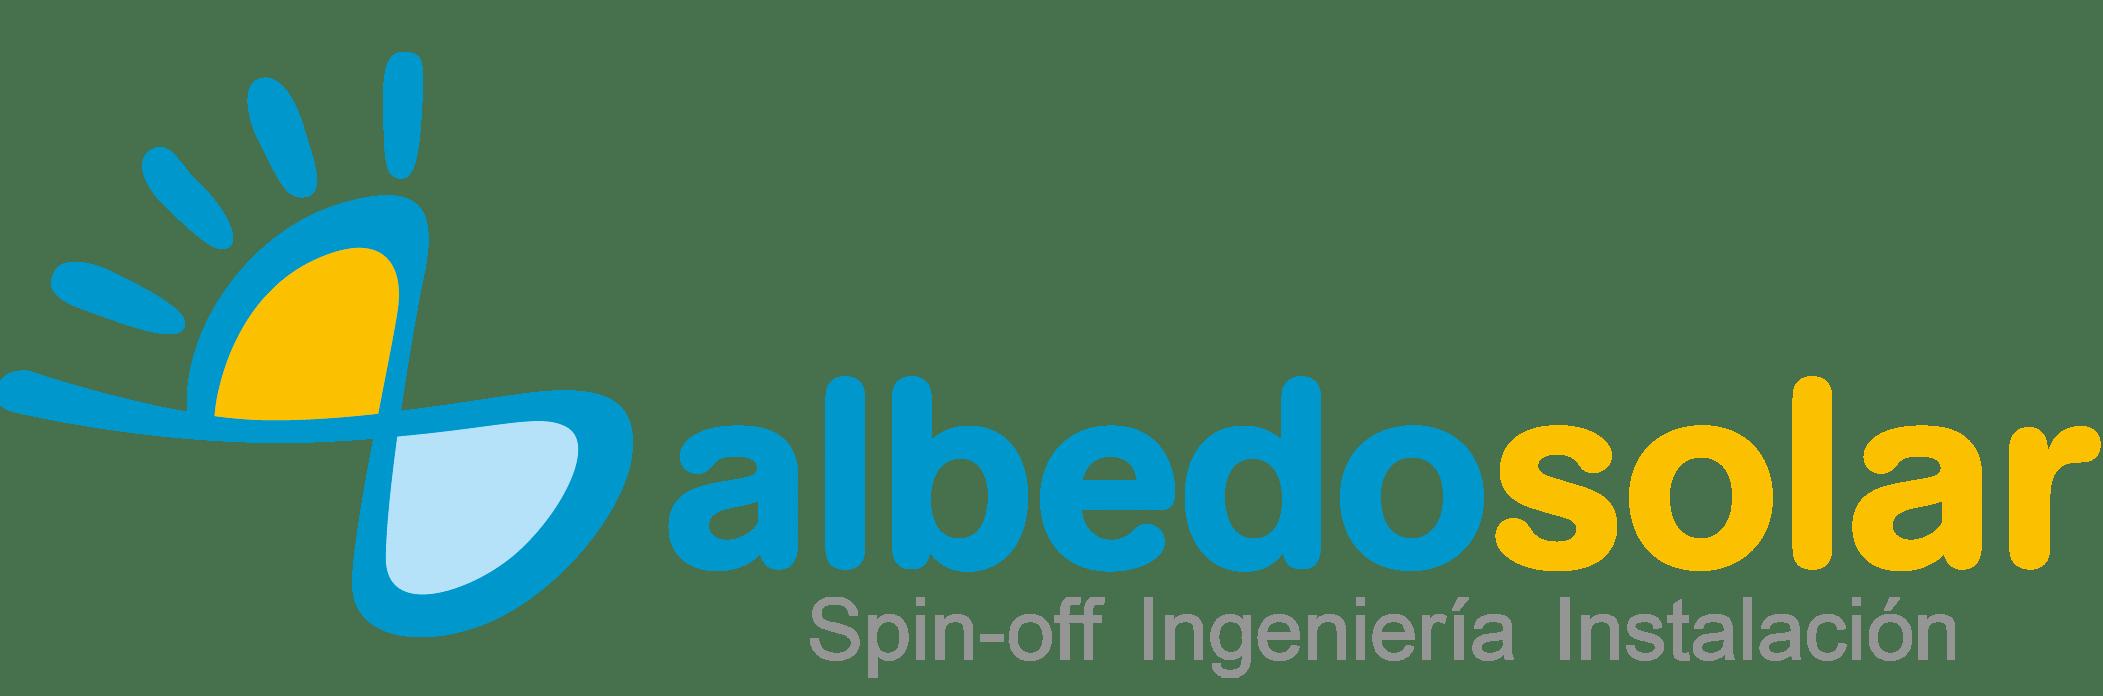 Imagen del logo de Albedo Solar